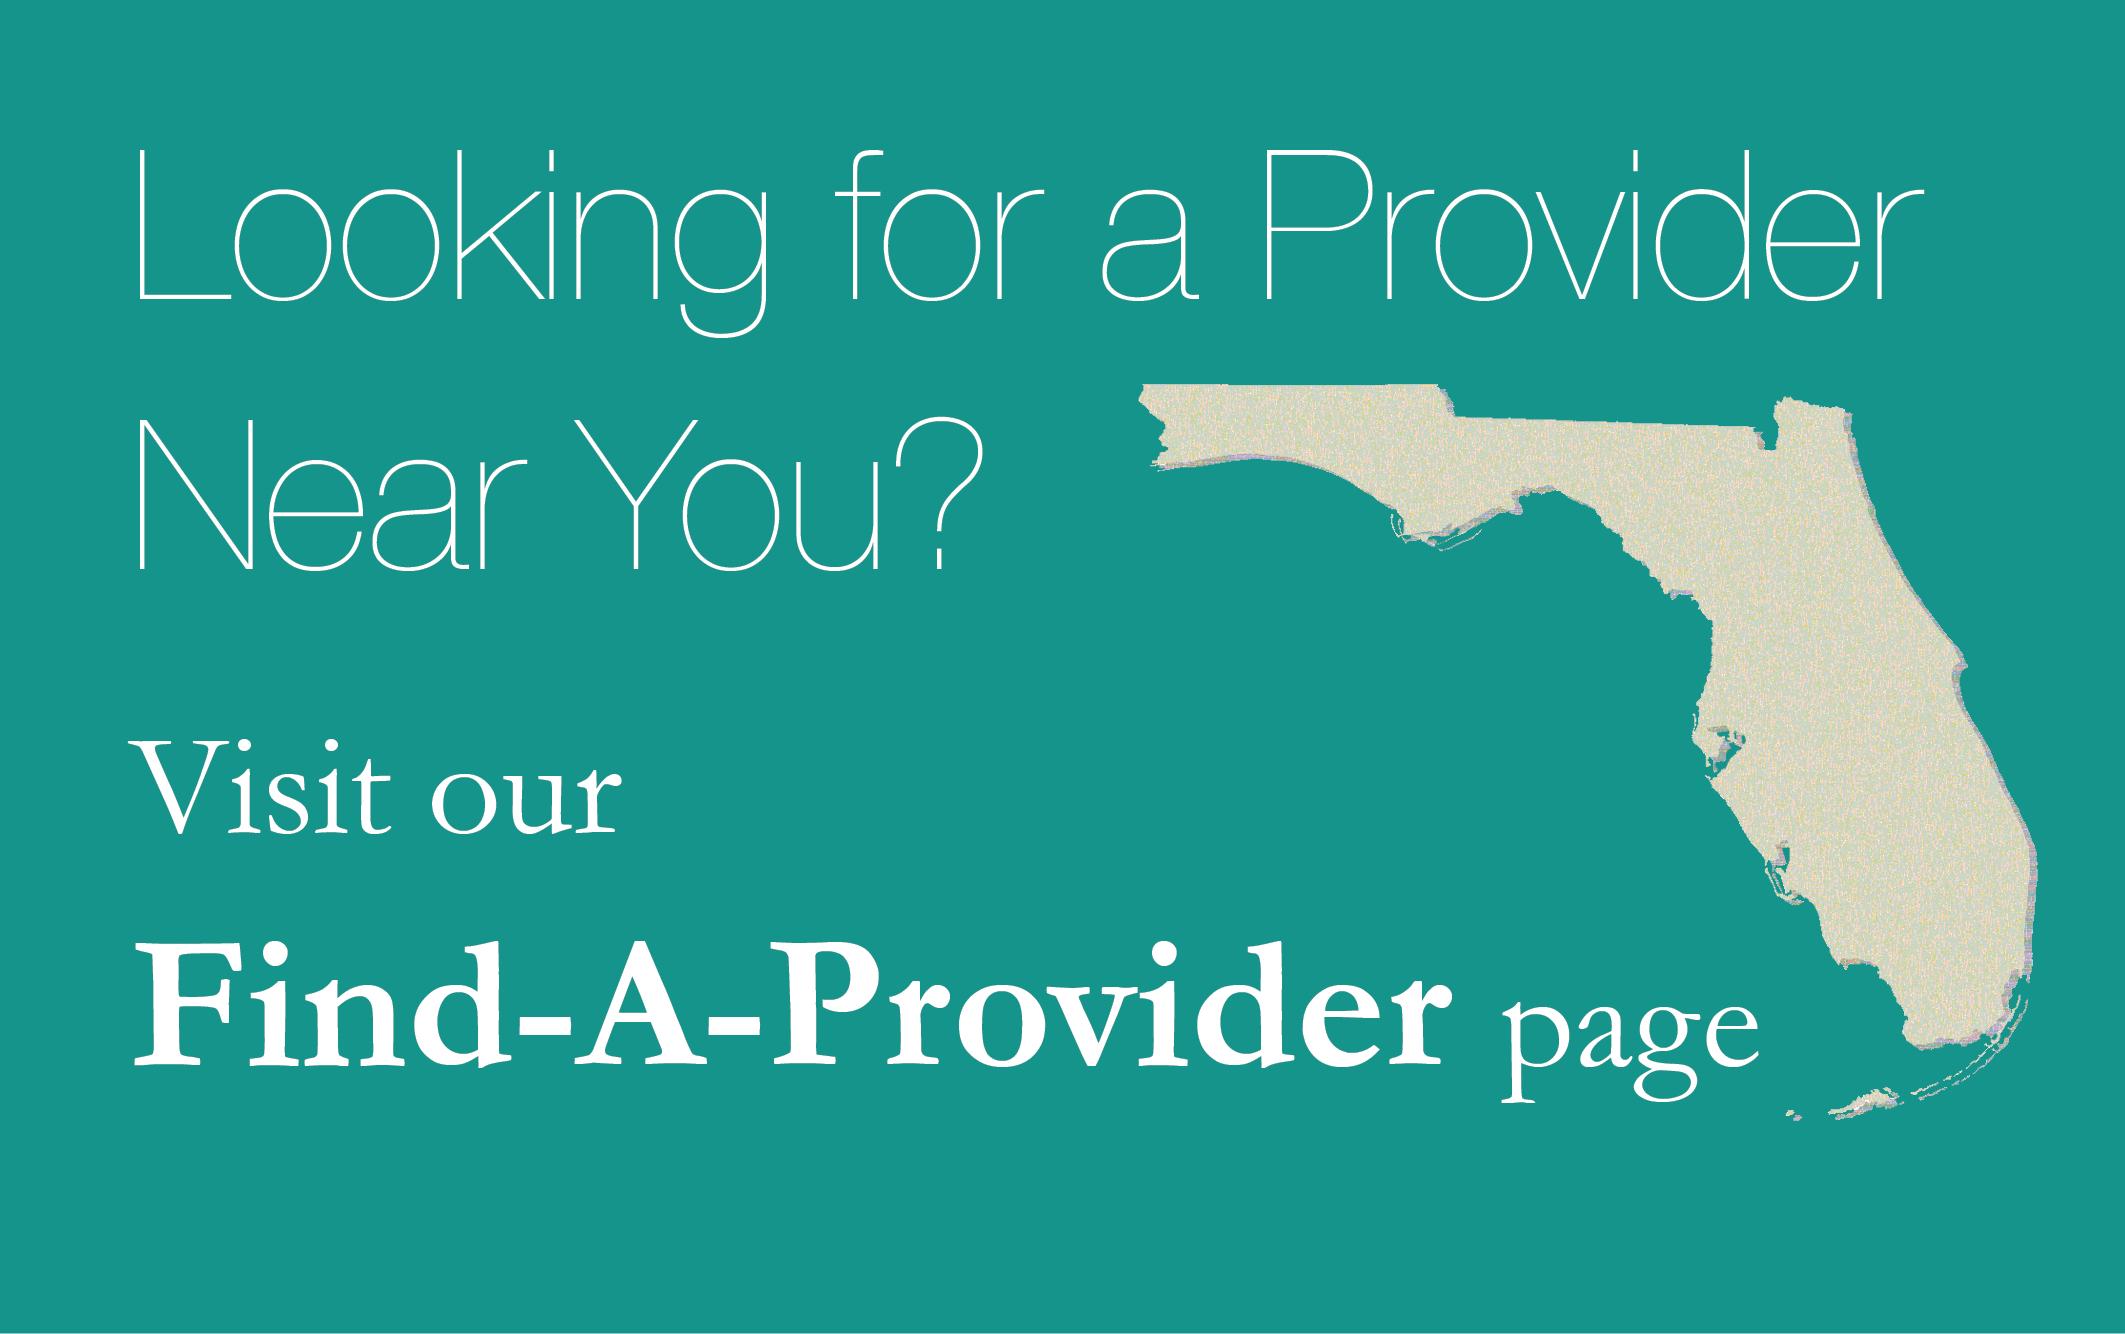 Florida Hospice & Palliative Care Association